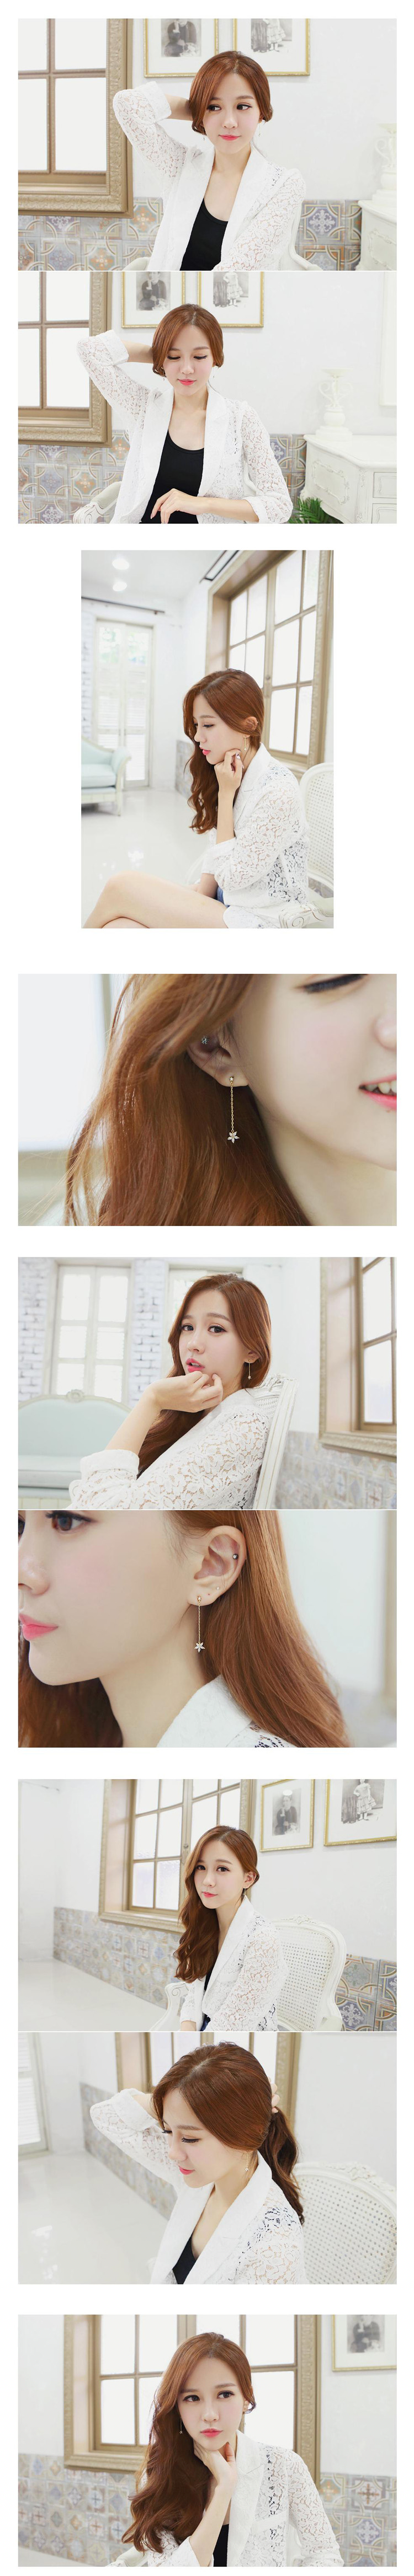 South Korea imported genuine purchasing sweet sweet earrings long section diamond flower earrings earrings 925 needles - Taobao Taiwan, omnipotent Taobao